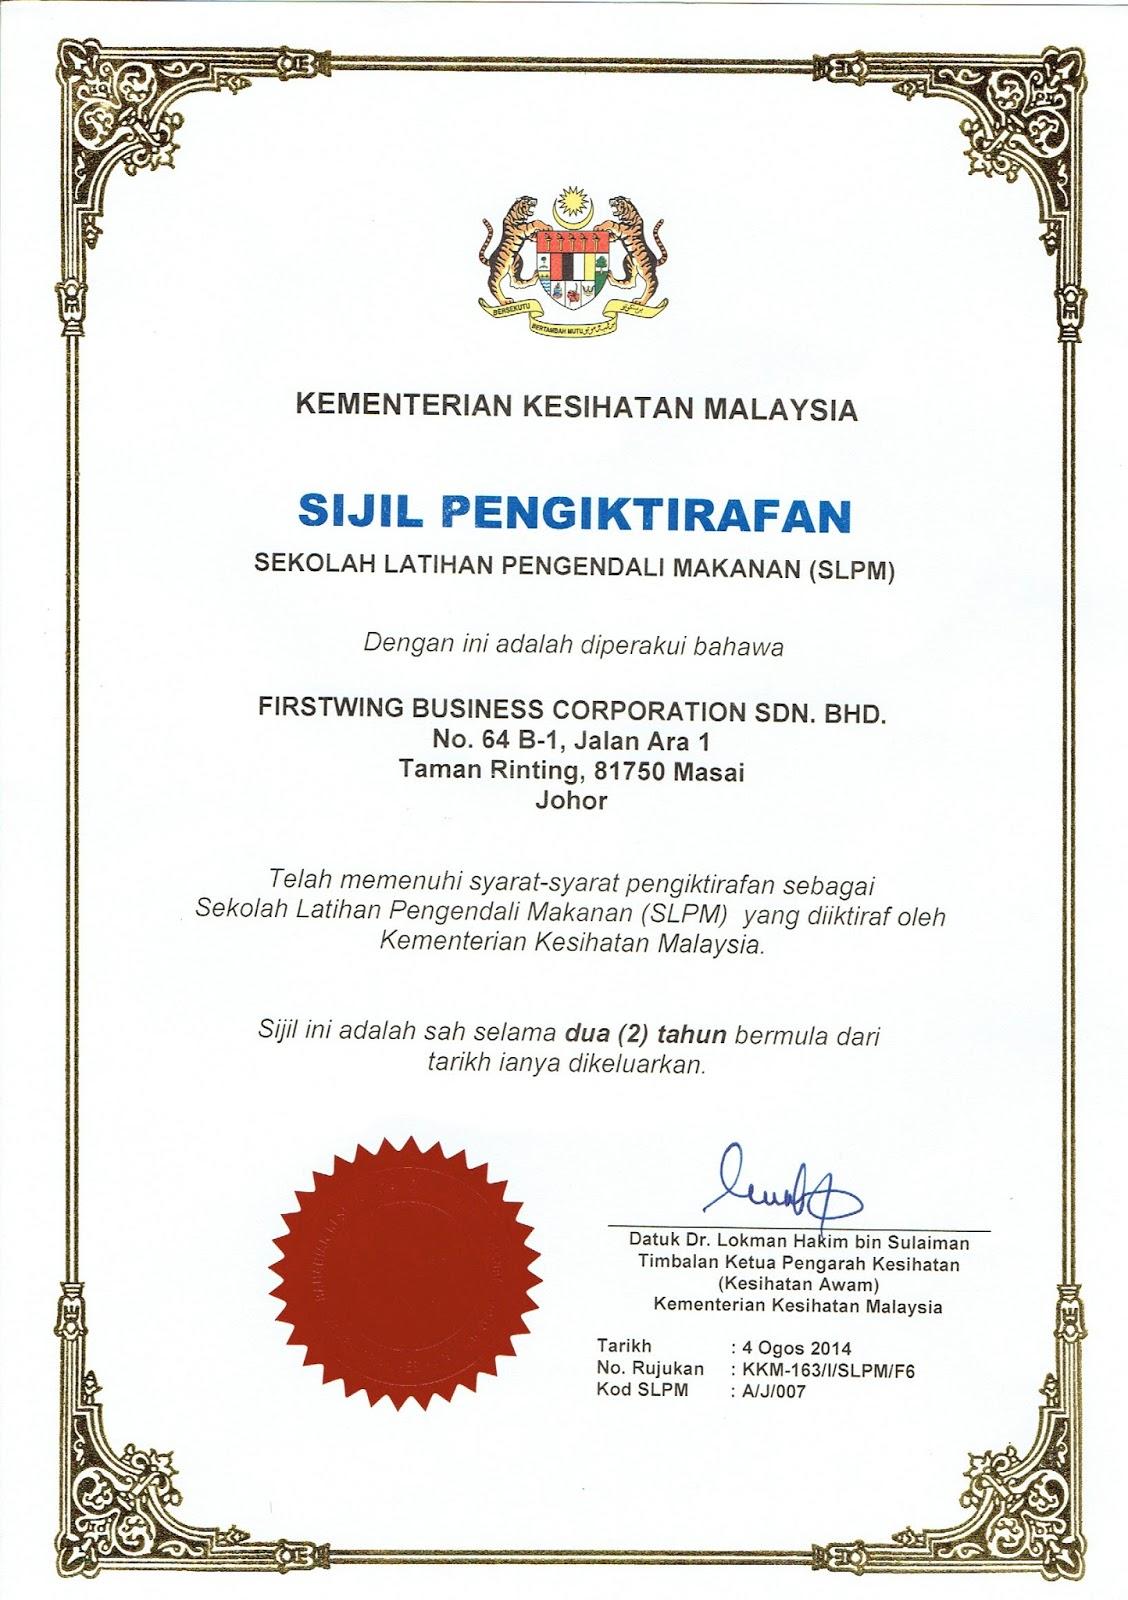 Sekolah Latihan Pengendali Makanan Johor Perokok U